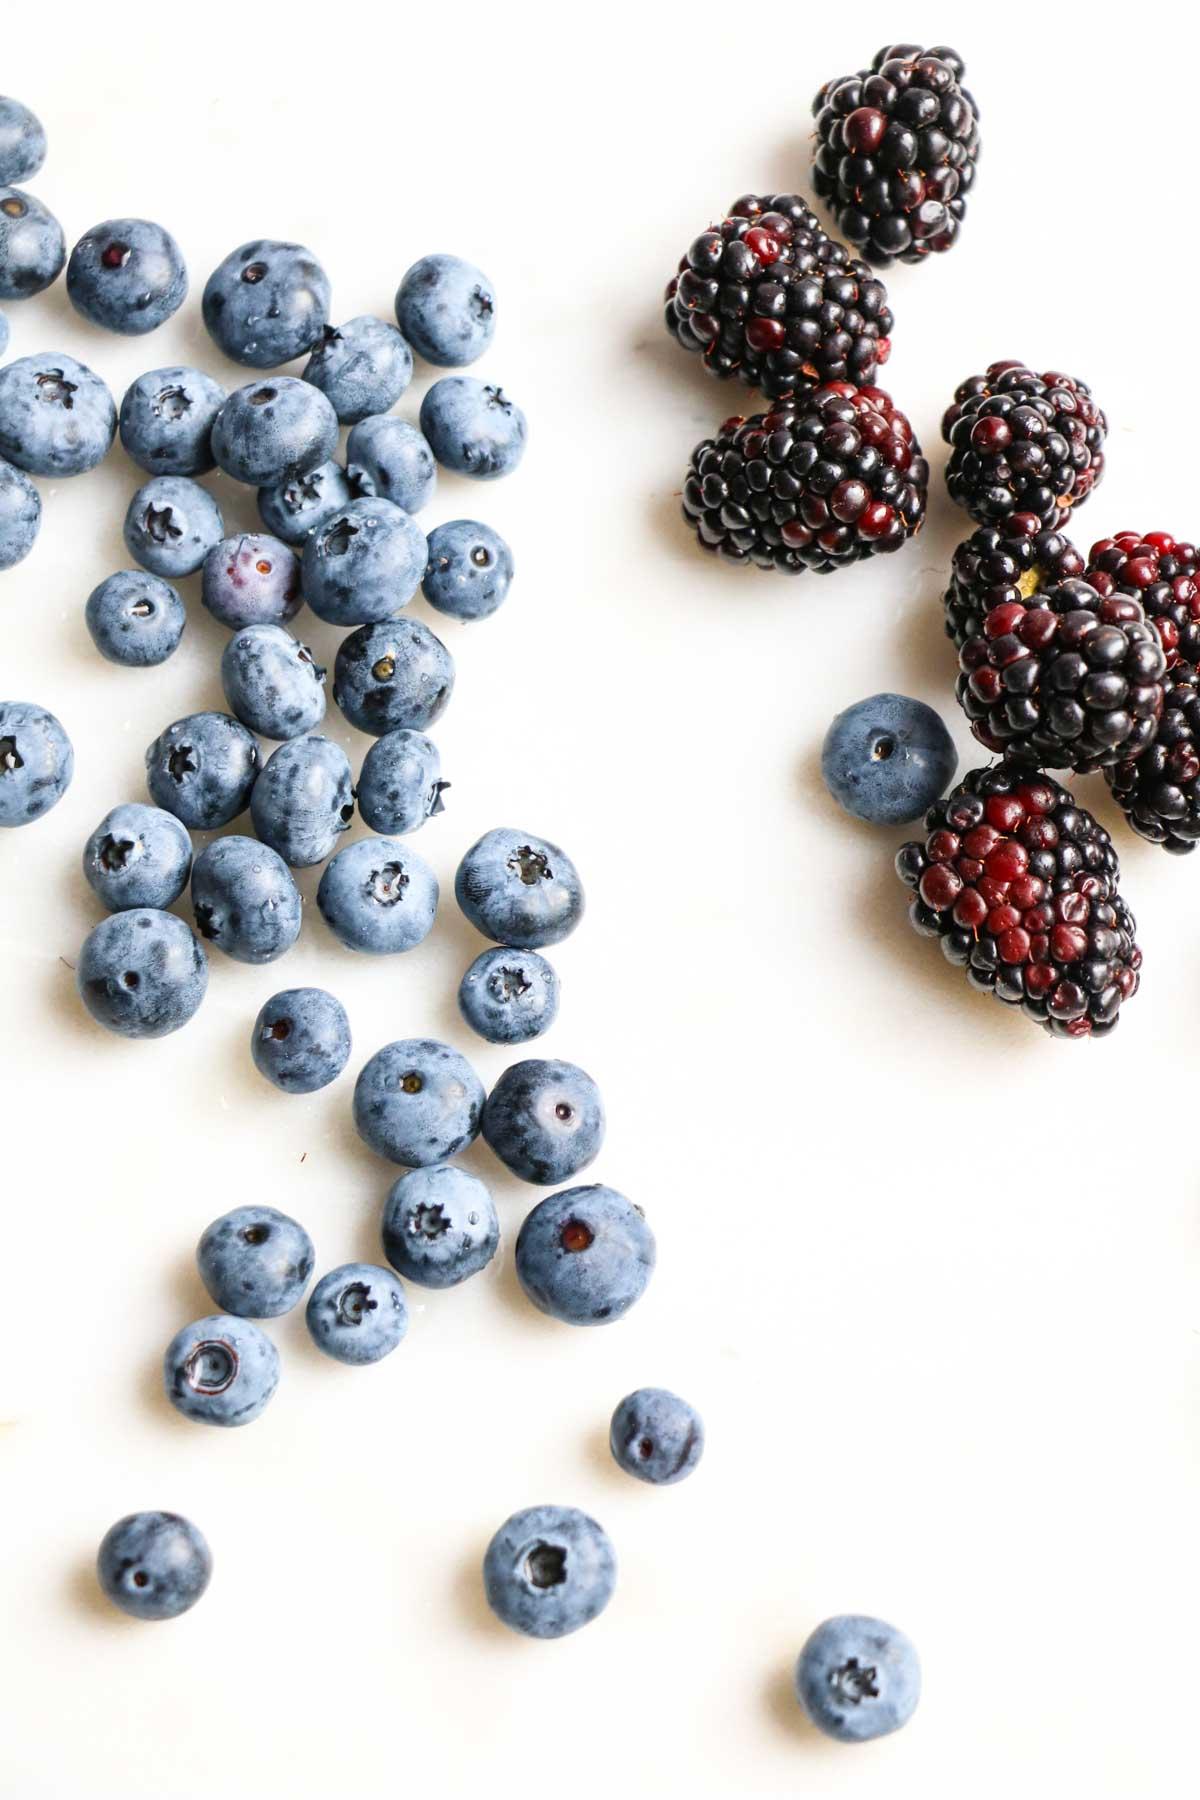 The freshest seasonal ingredients create a beet salad with berries and avocado basil vinaigrette. Vegan, gluten free, paleo, Whole30.  abraskitchen.com